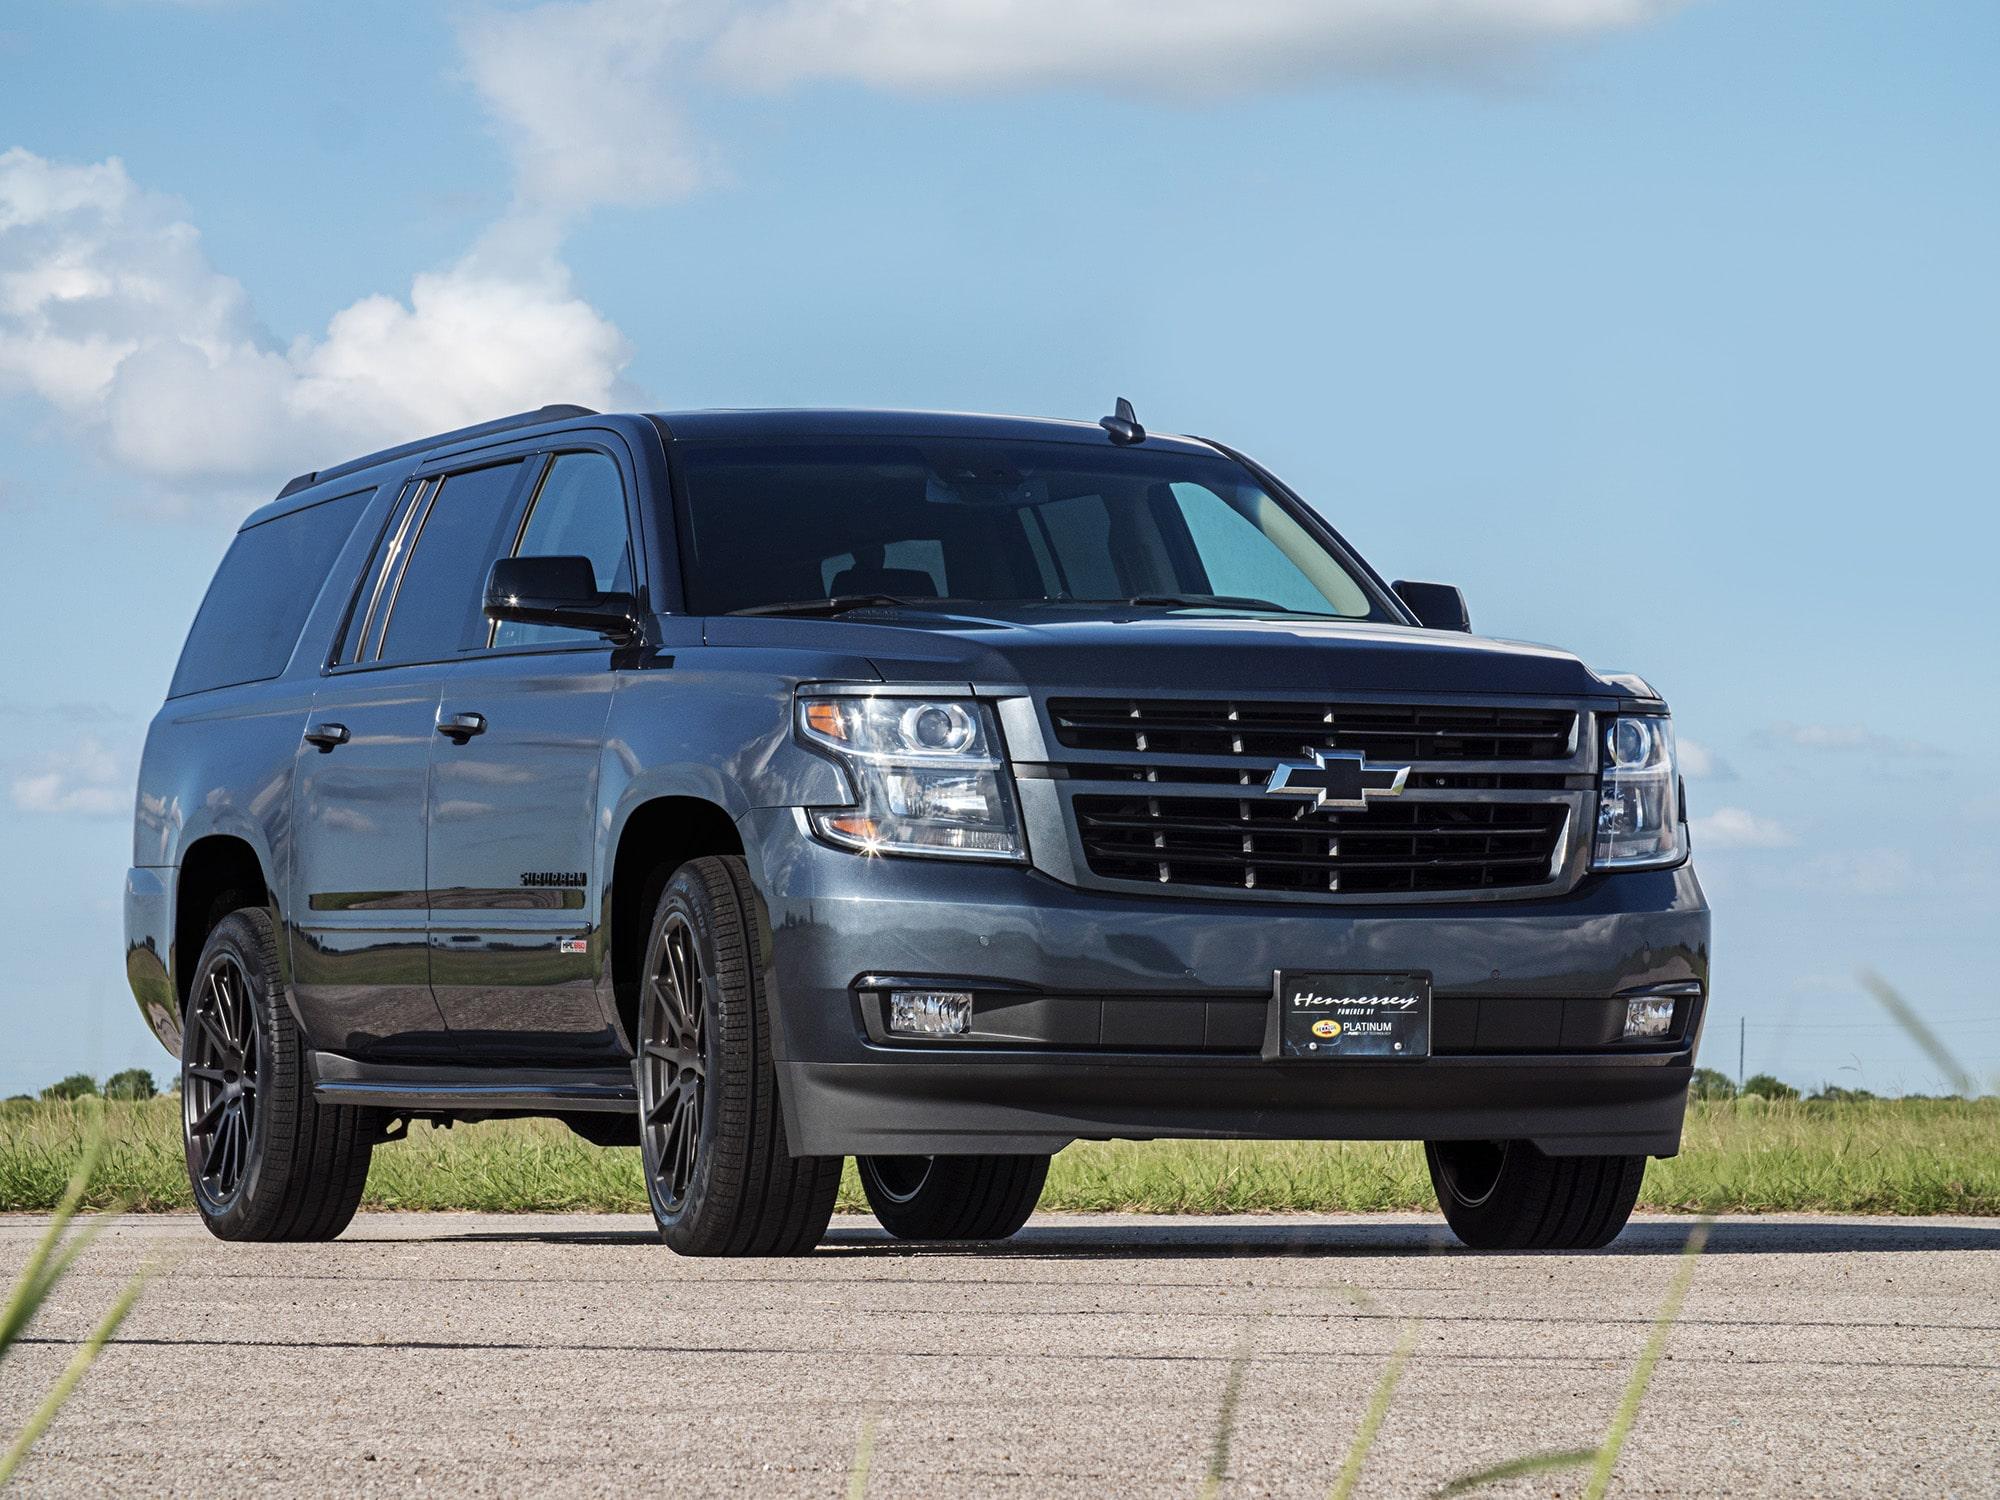 Hennessey HPE650 Chevrolet Suburban RST 2018 HPE650-2018-Chevy-Suburban-Dark-Blue-6-min